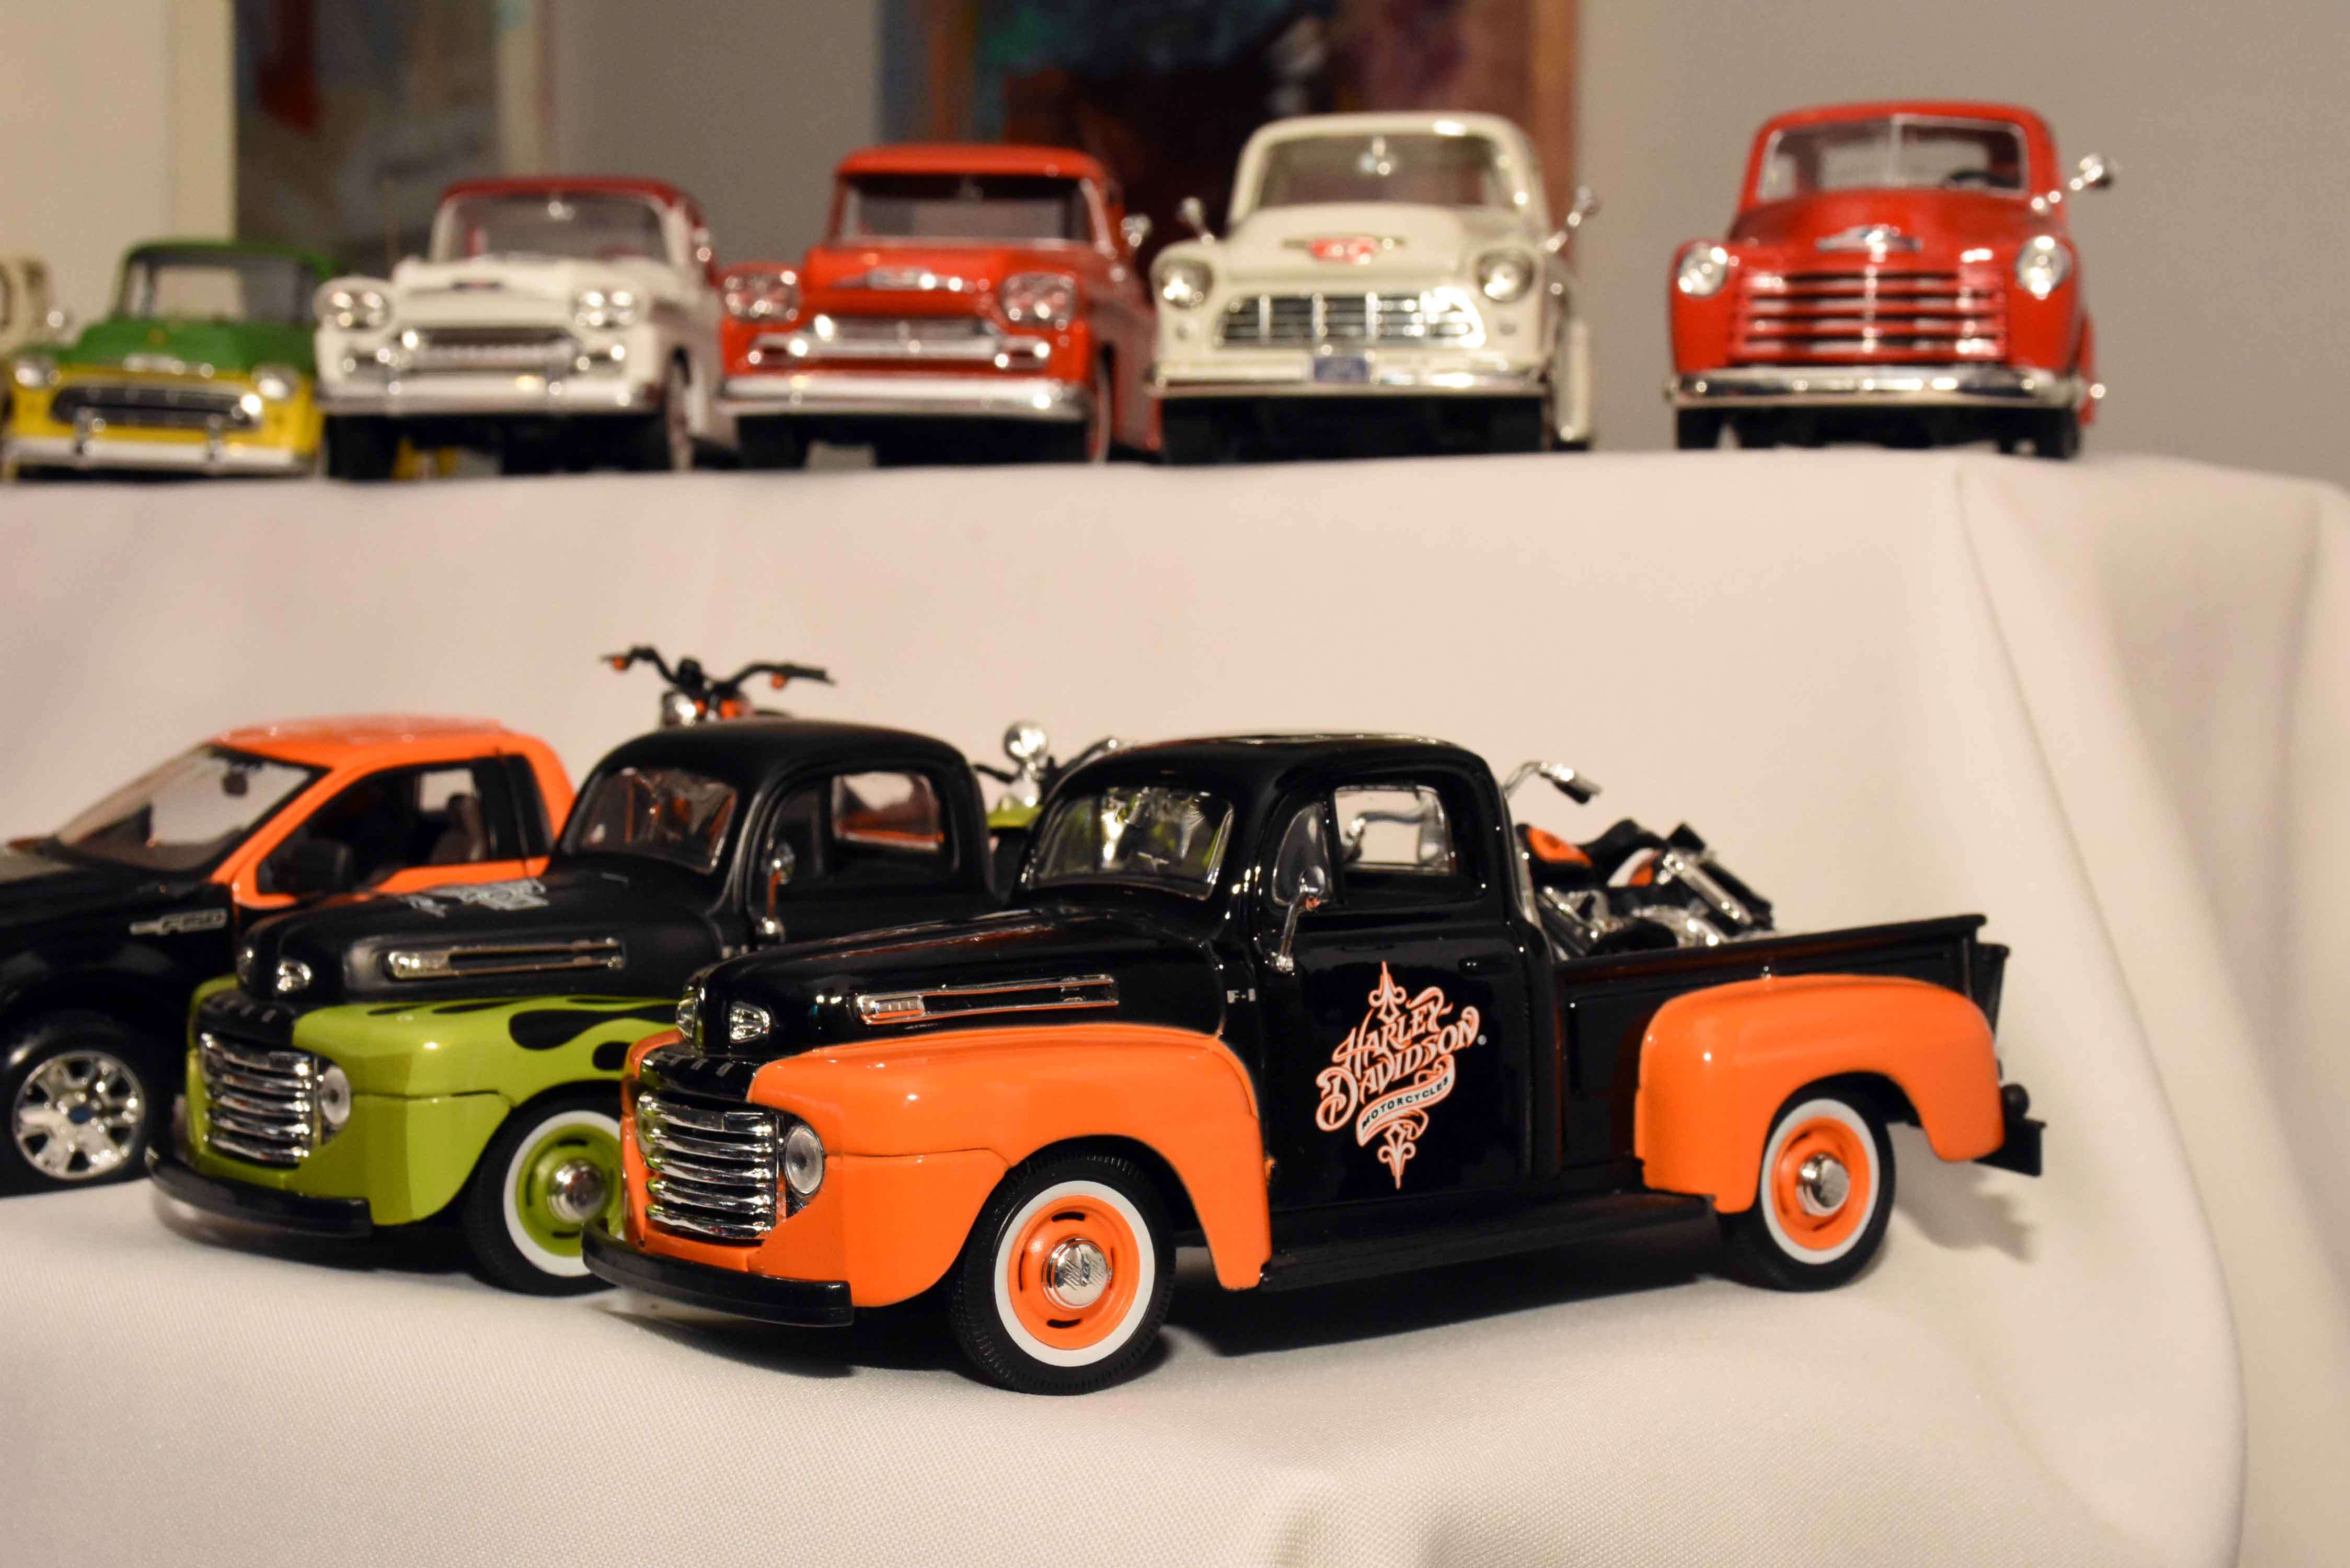 Exposición de autos a escala en La Barraca (22)